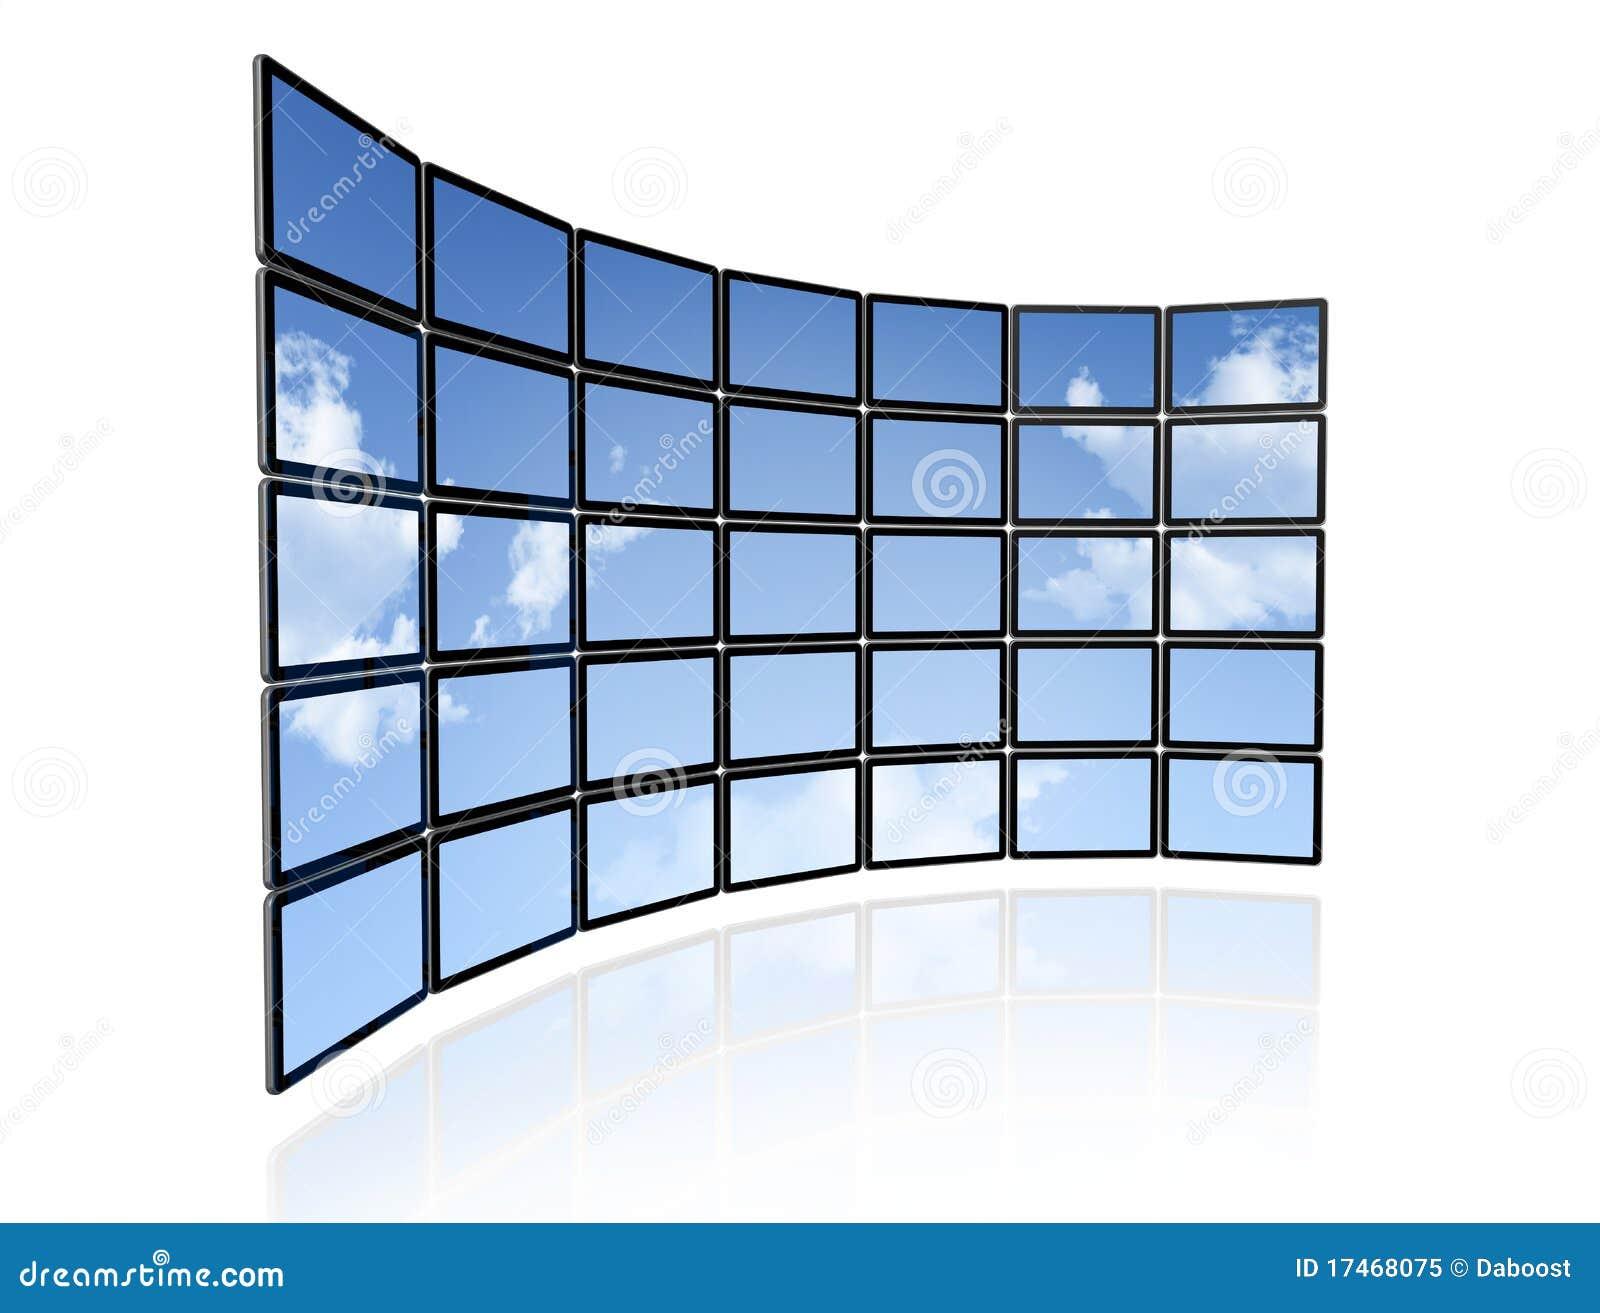 Video wall of flat tv screens